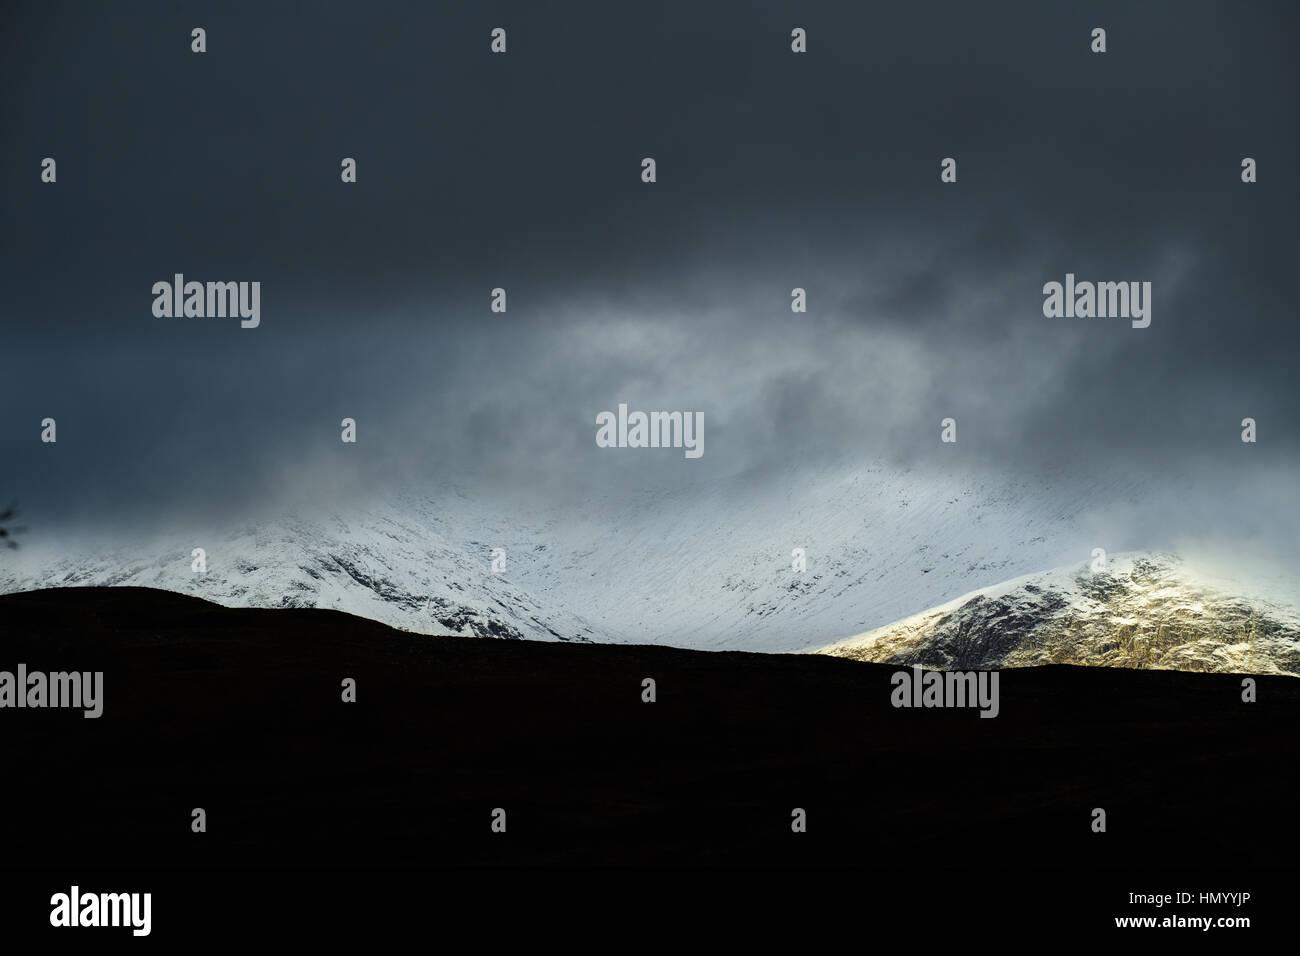 Black Mount, the highlands, Scotland, Britain. - Stock Image